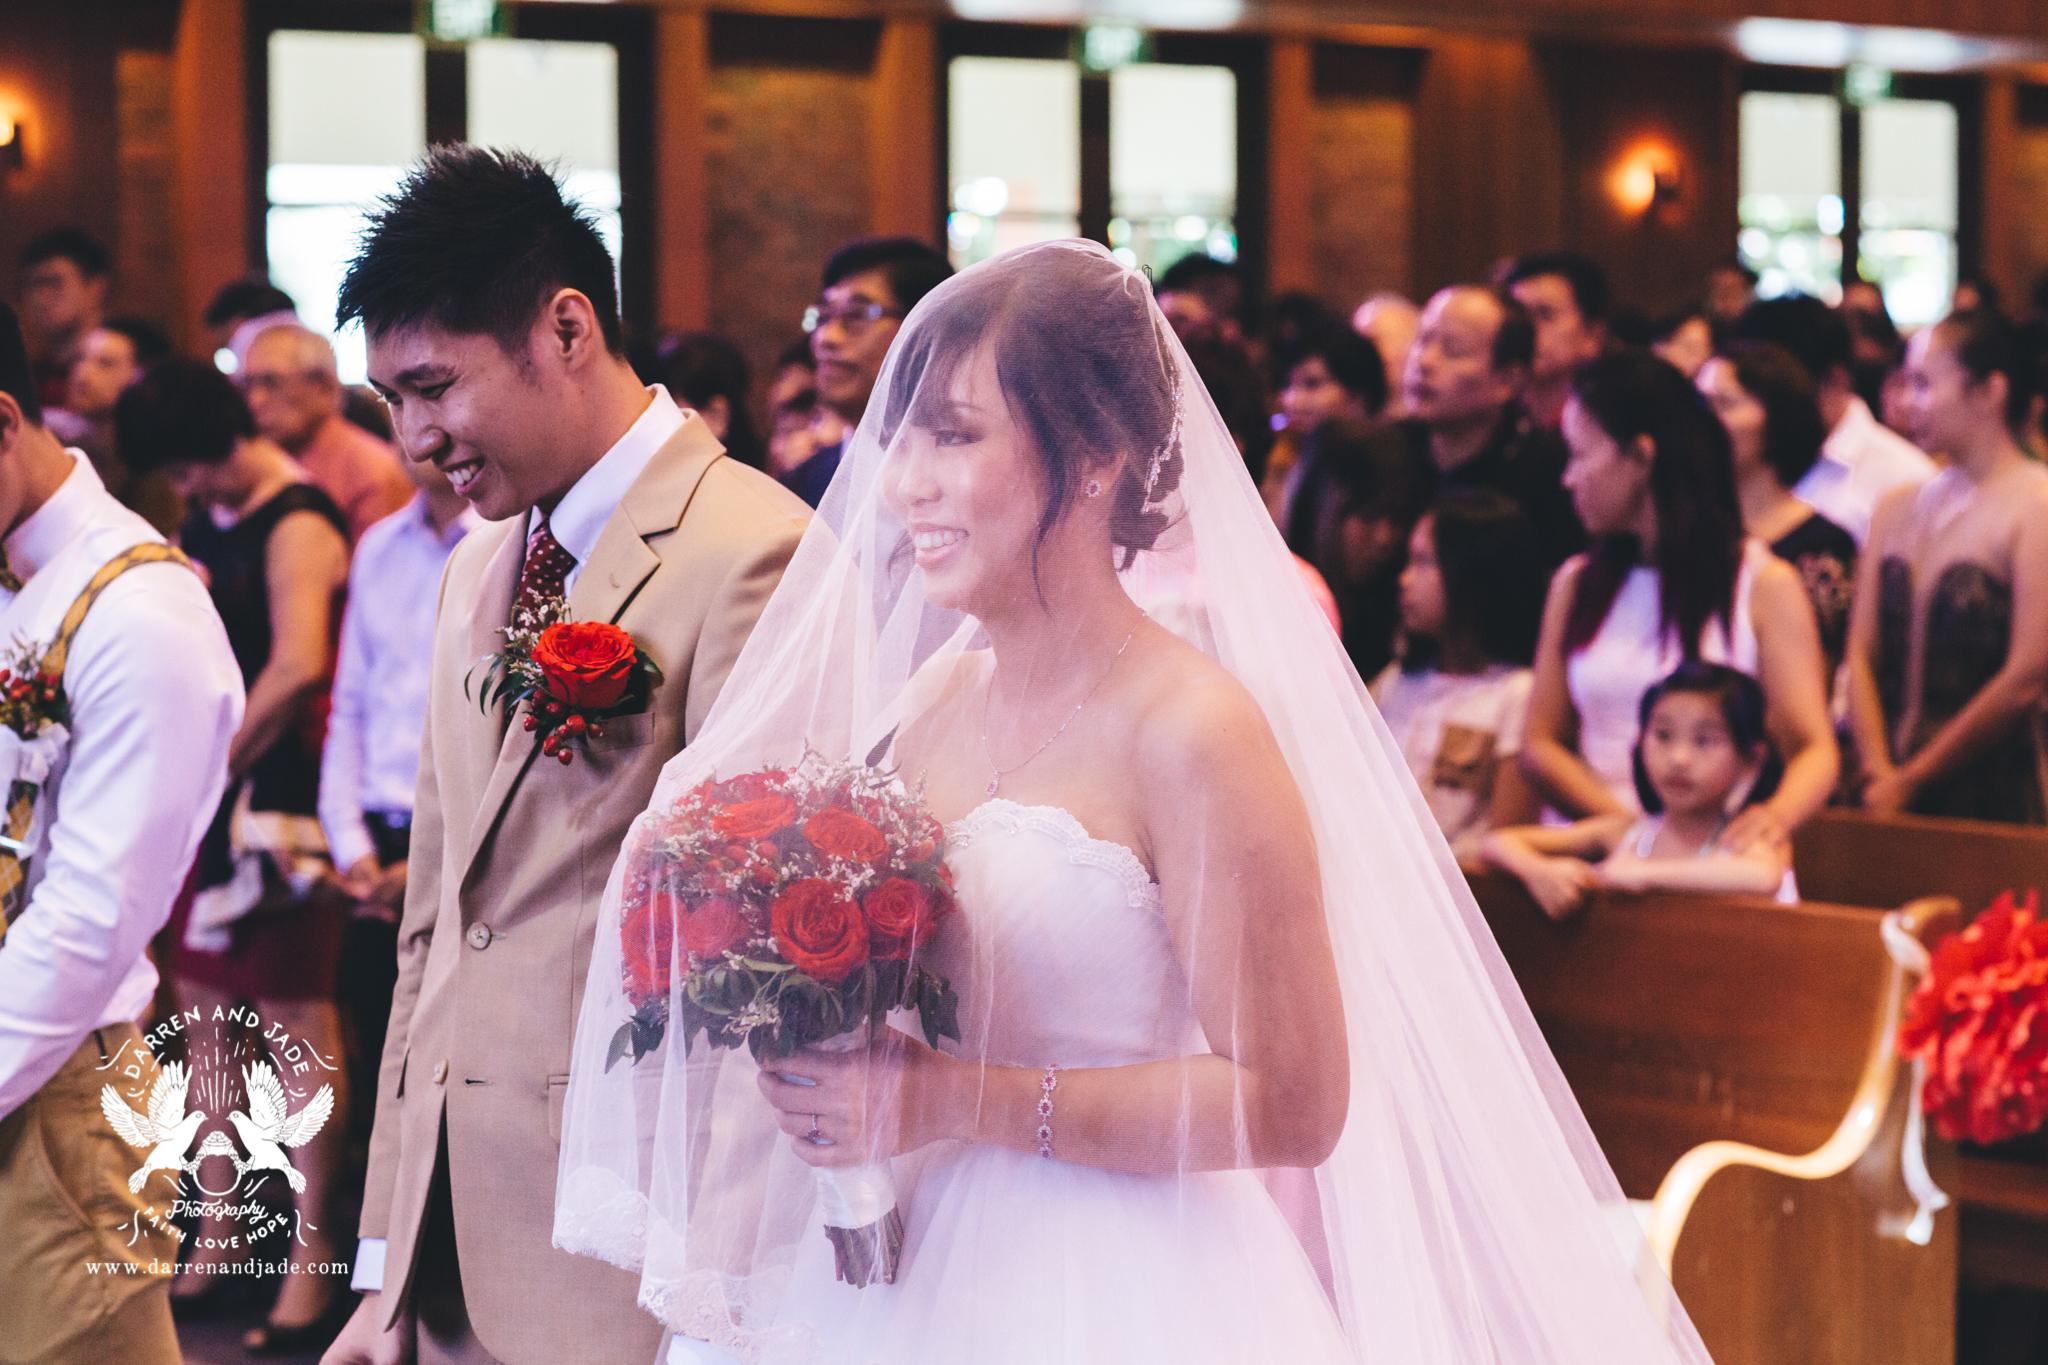 Bel & Emans - Wedding - Blog (38 of 69).jpg